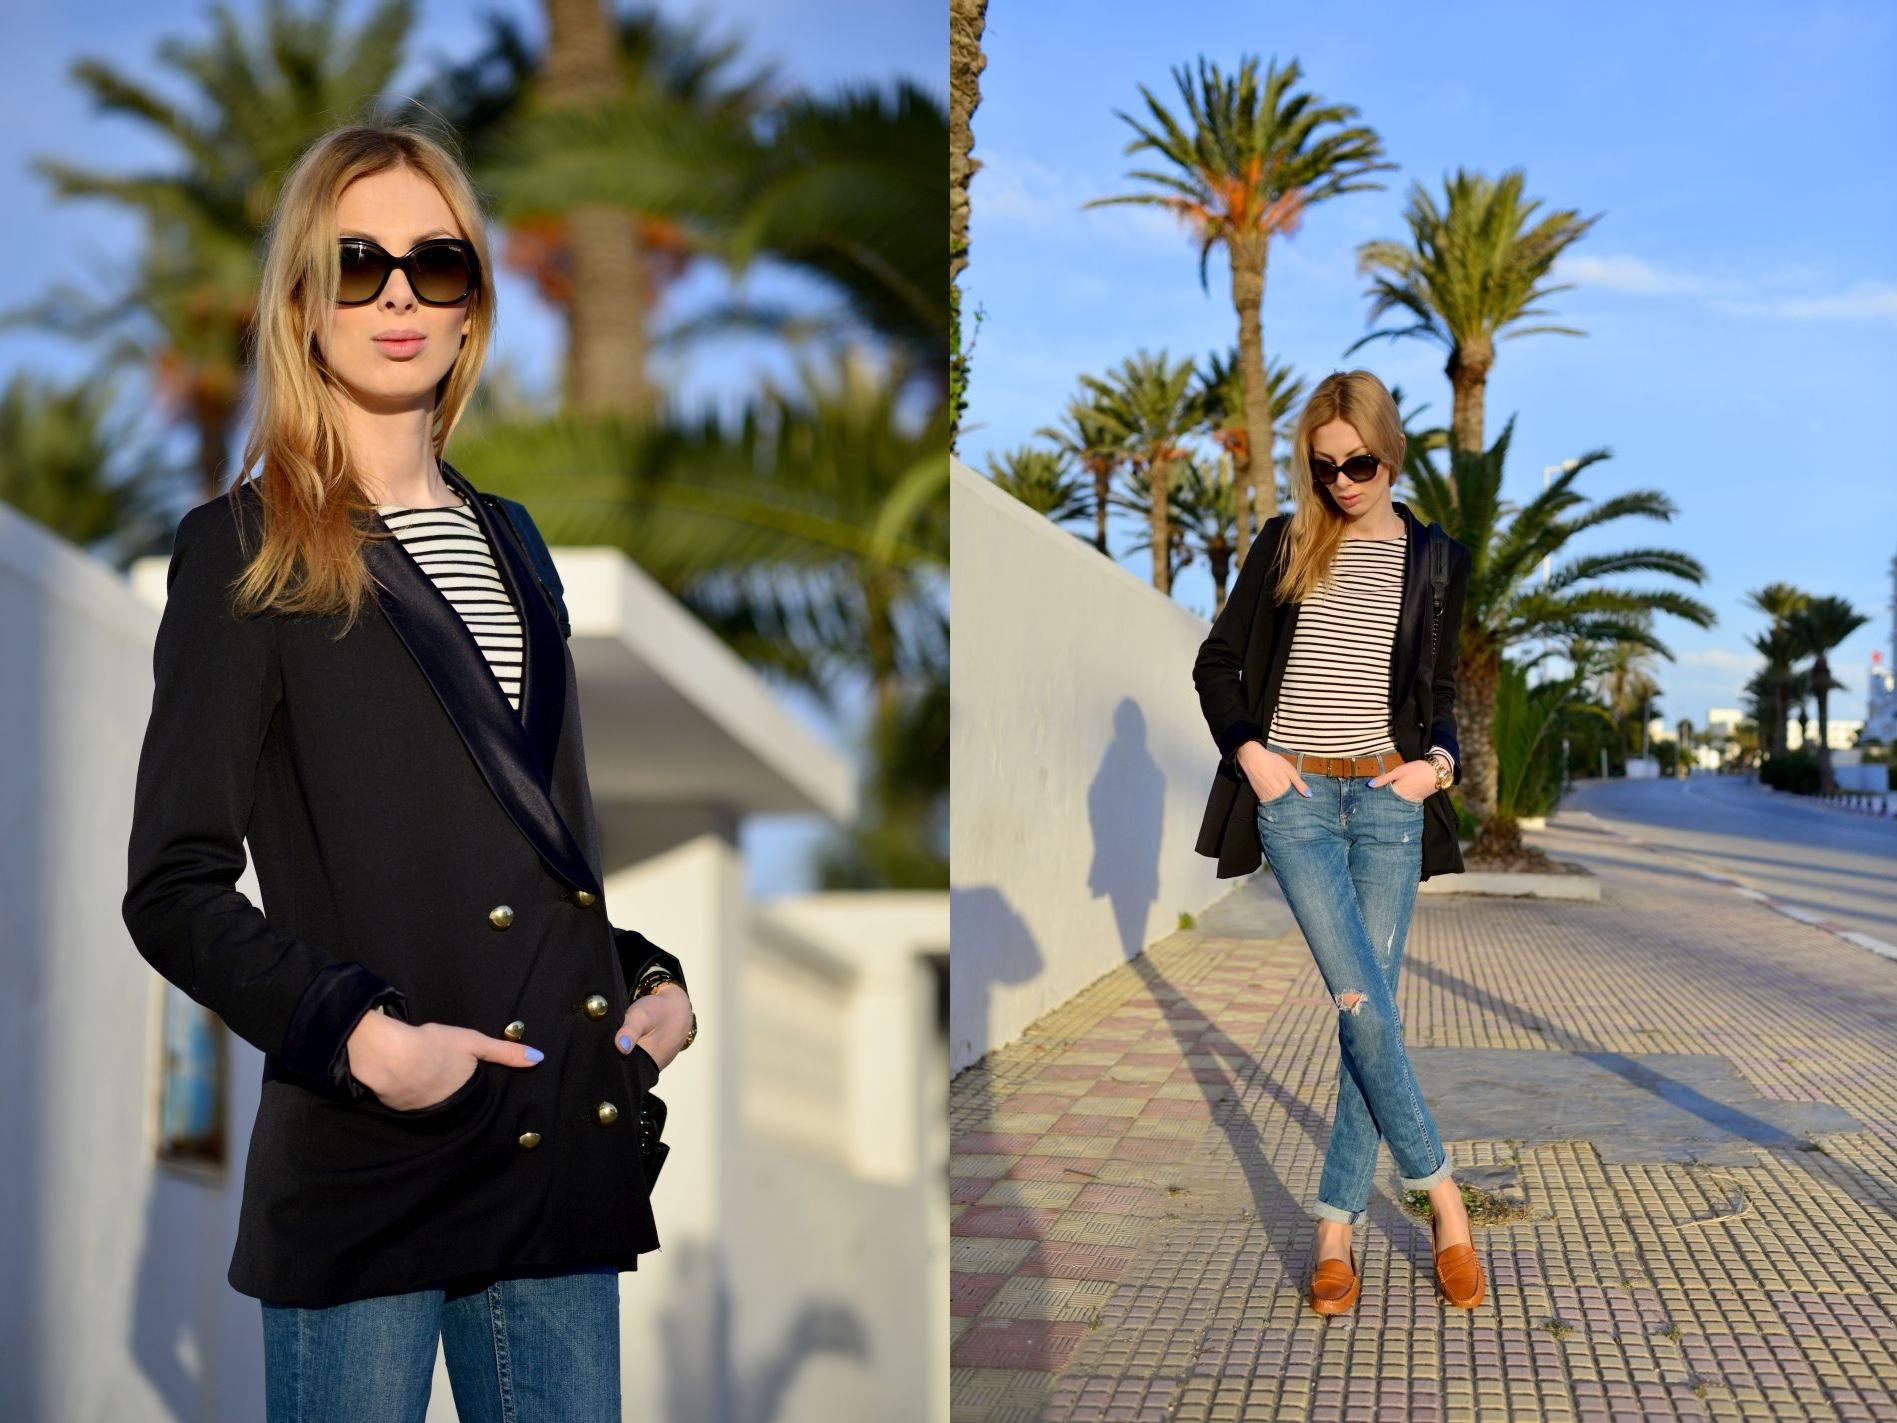 charlize mystery tunezja, okulary vogue eyewear, bluzka w paski